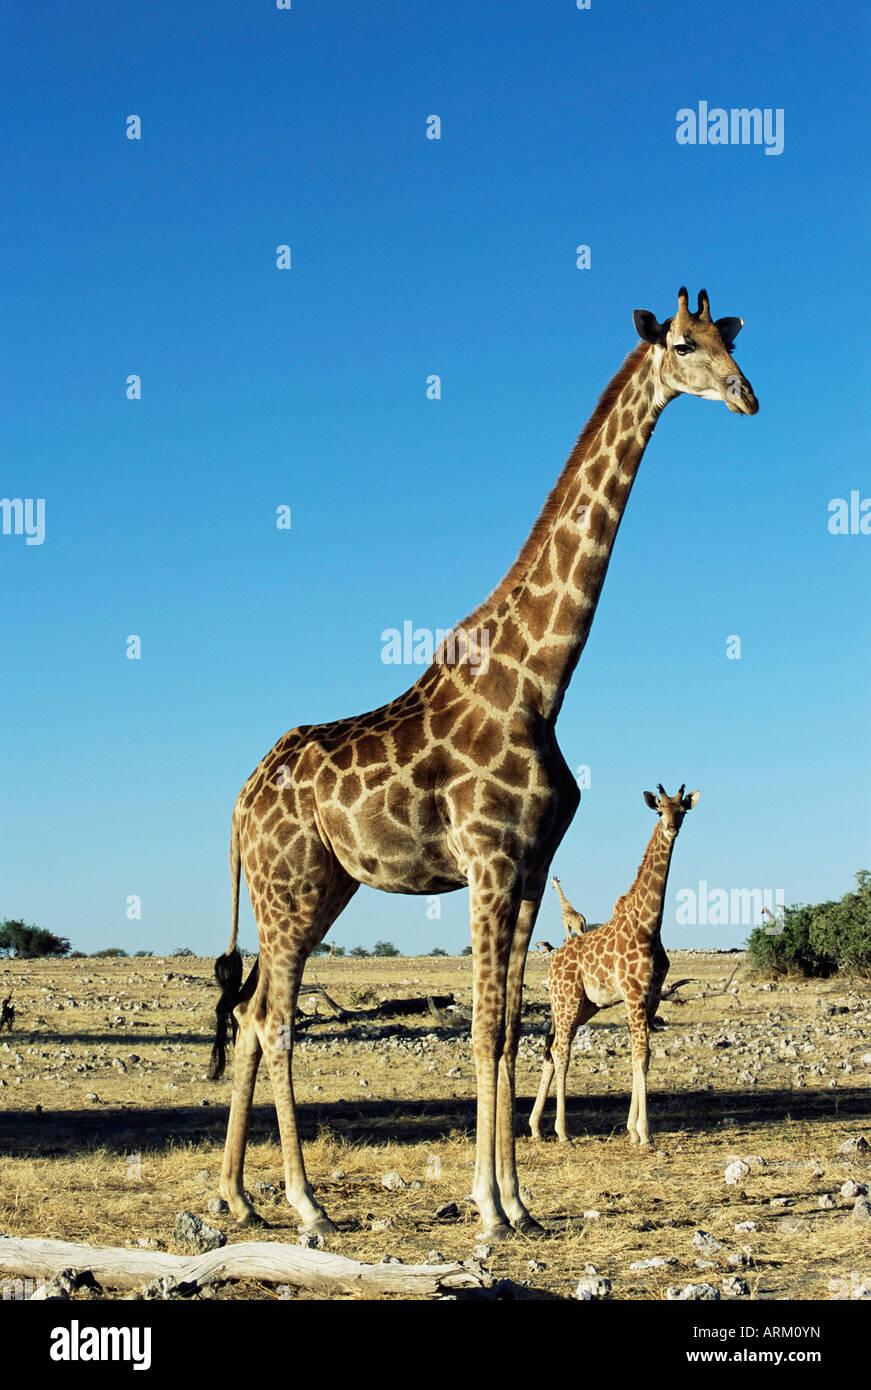 Giraffe, Giraffa camelopardalis, Etosha National Park, Namibia, Africa - Stock Image